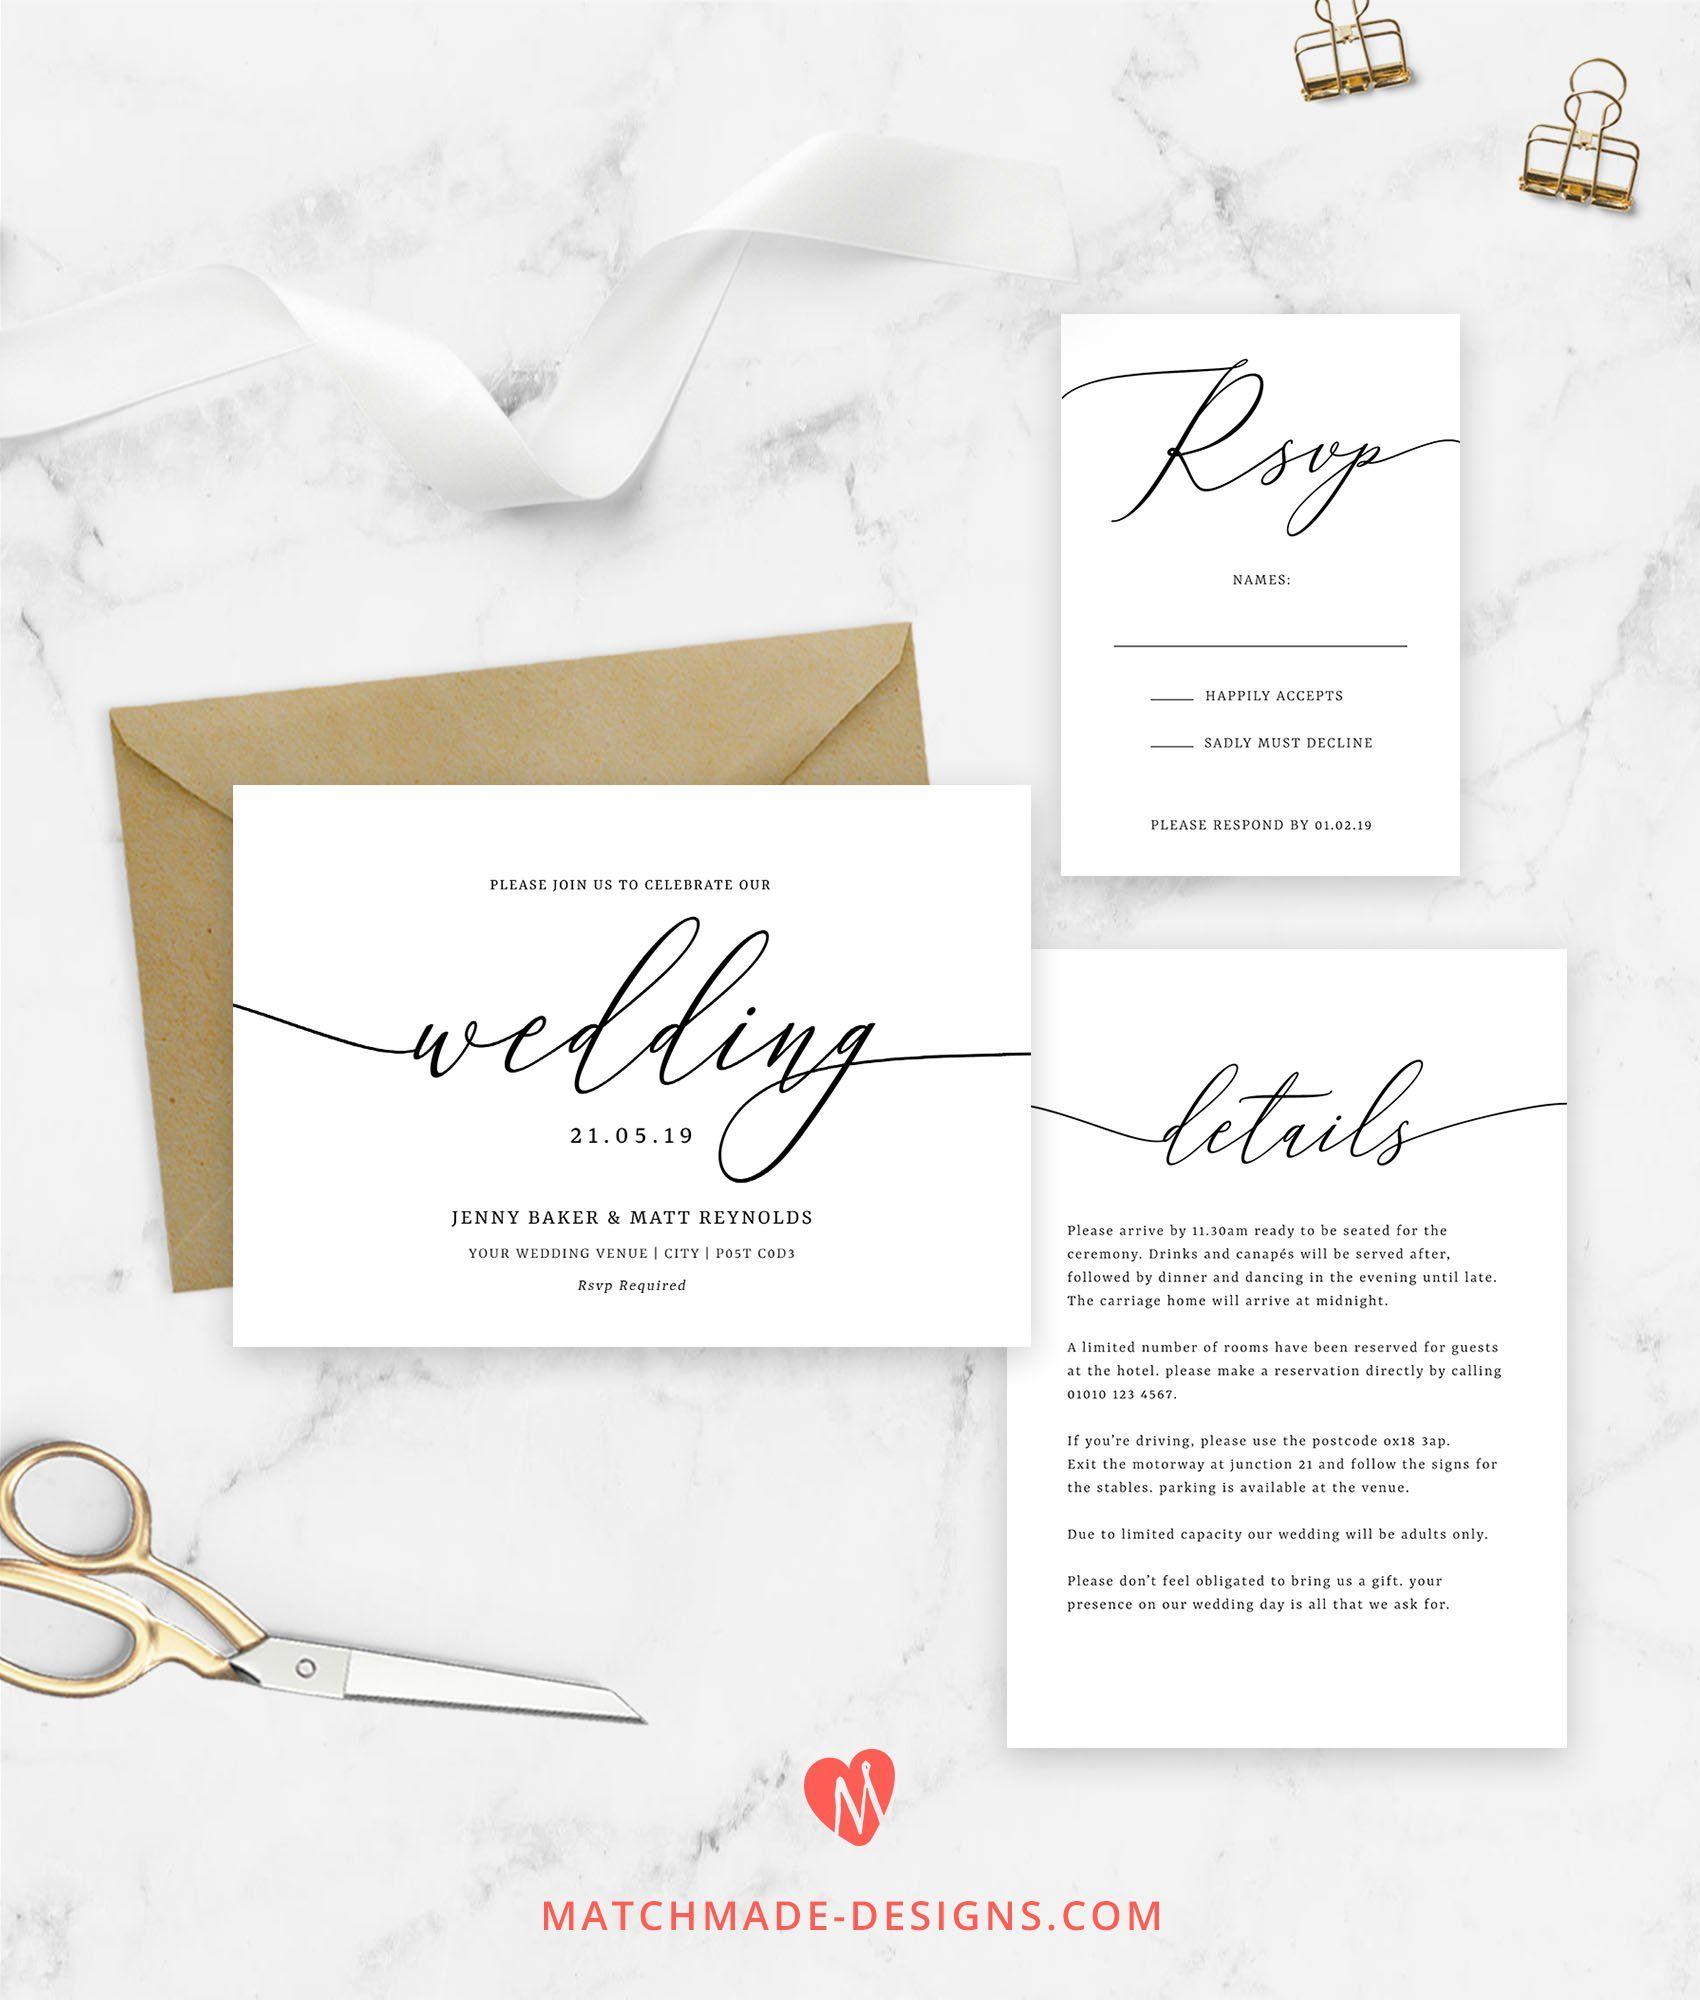 Calligraphy Wedding Invitations Template Editable